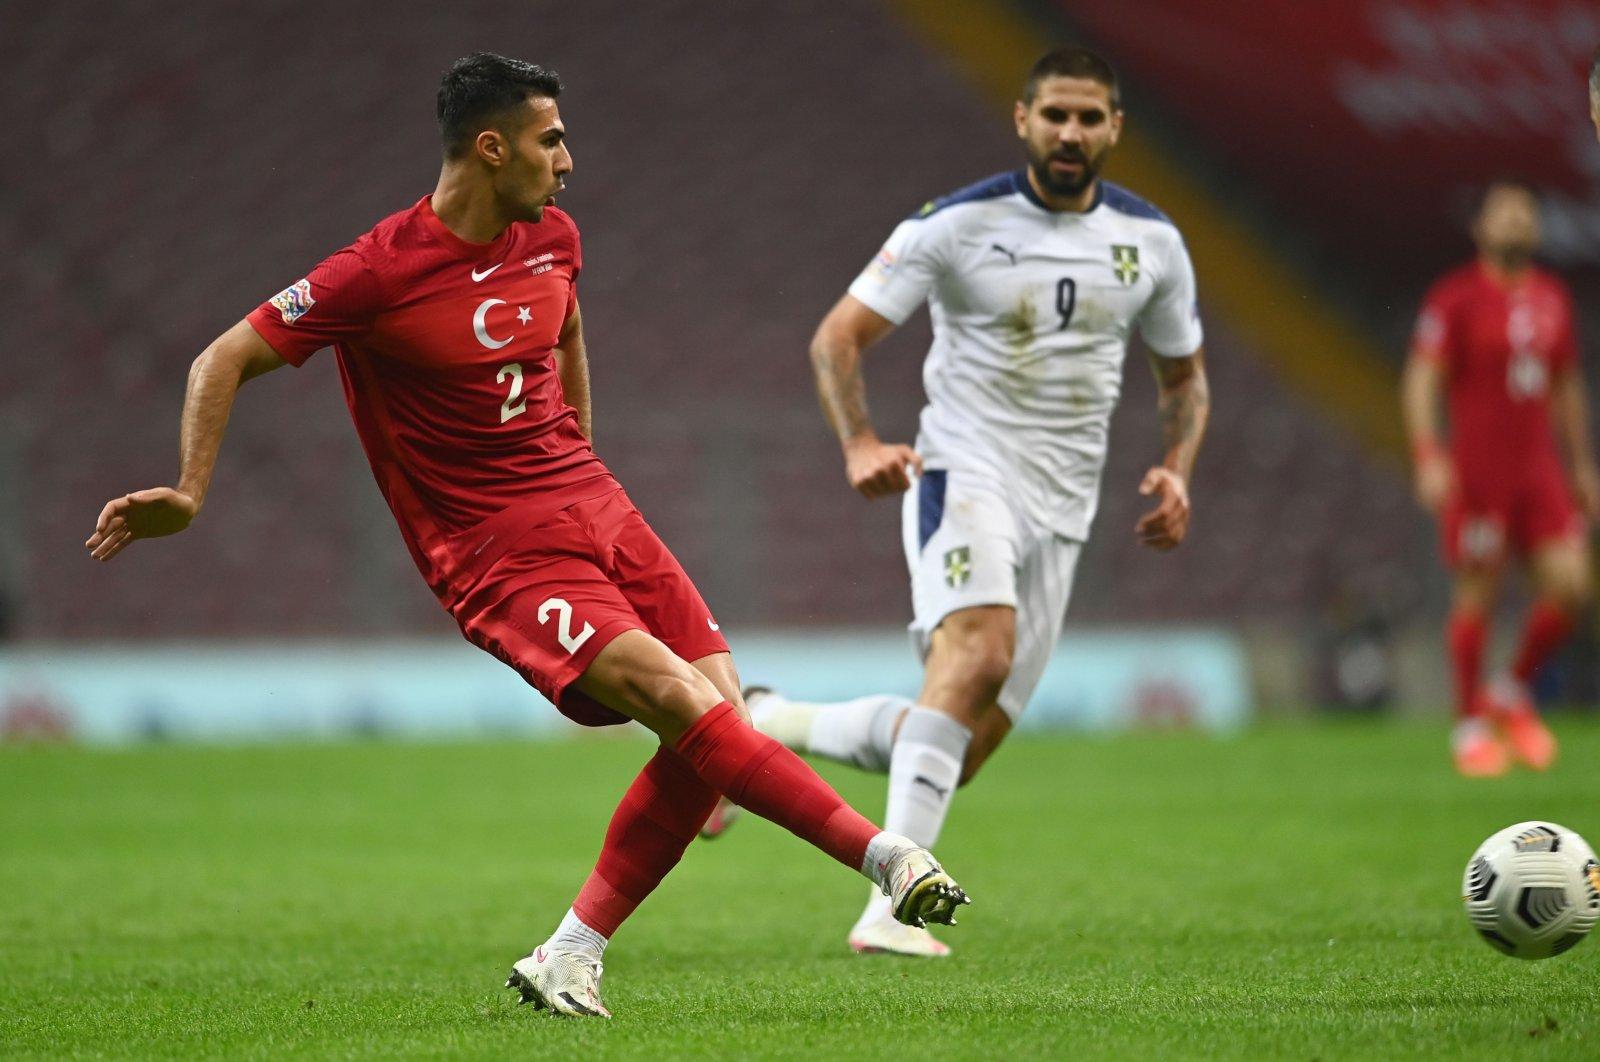 Serbia's Aleksandar Mitrovic (R) tries to intercept as Turkey's Zeki Çelik passes the ball during a UEFA Nations Leage Match against Serbia, in Istanbul, Turkey, Oct. 14, 2020. (AFP Photo)